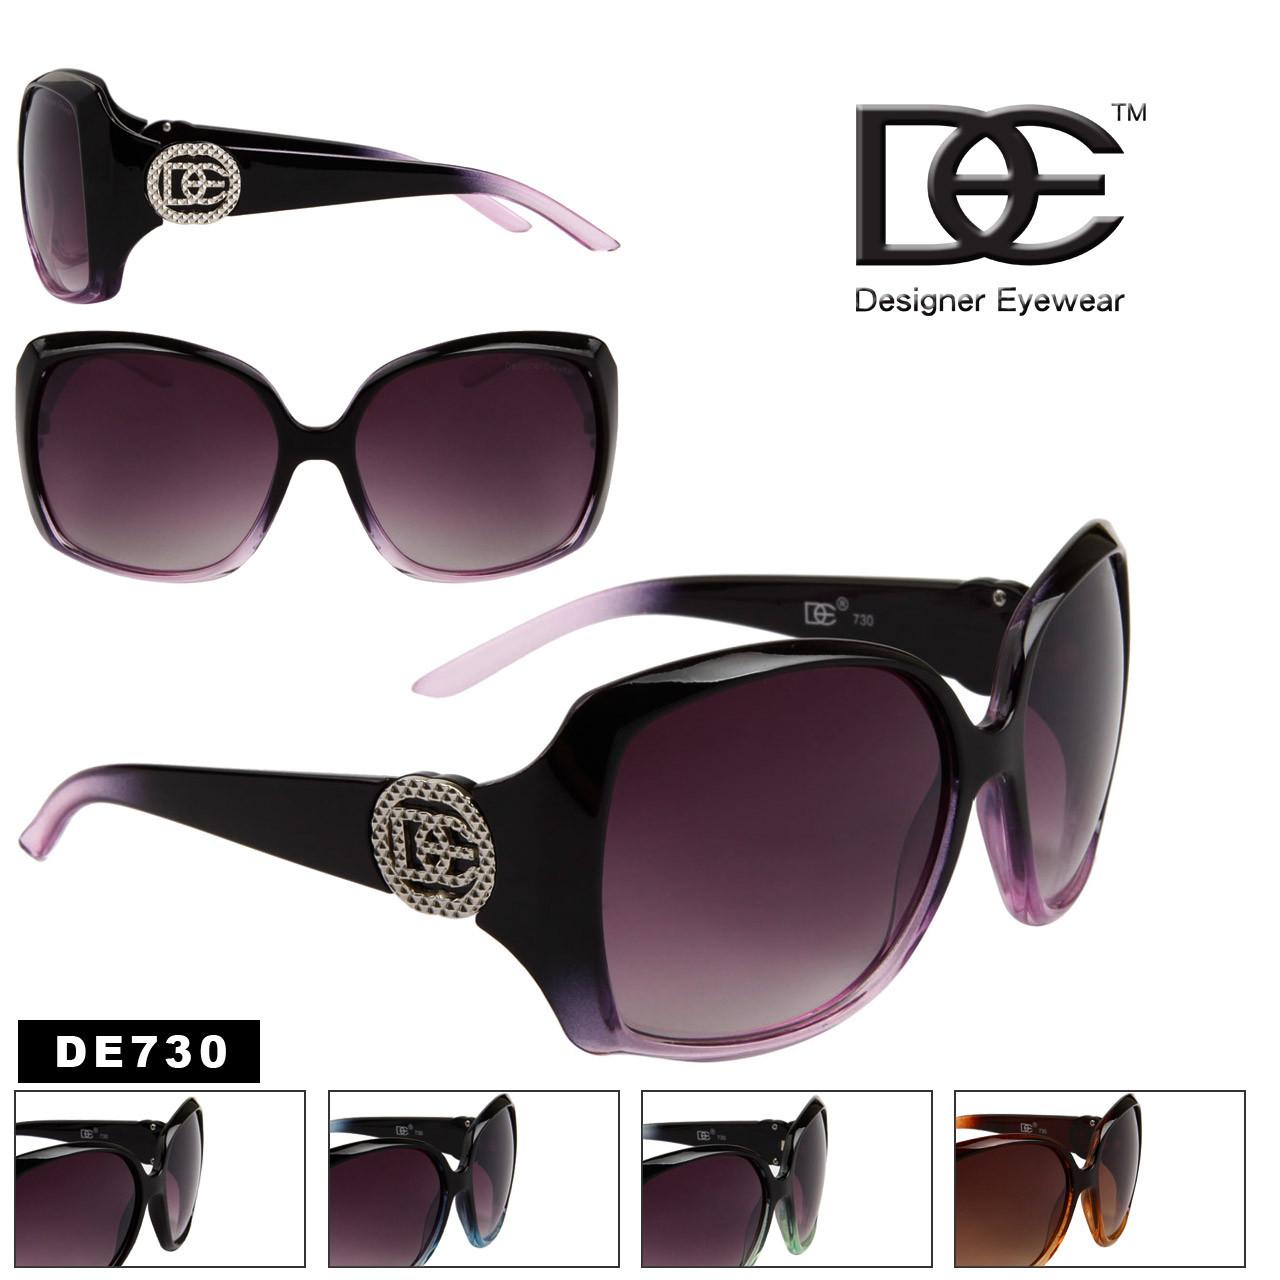 Wholesale Designer Eyewear Sunglasses - Style # DE730